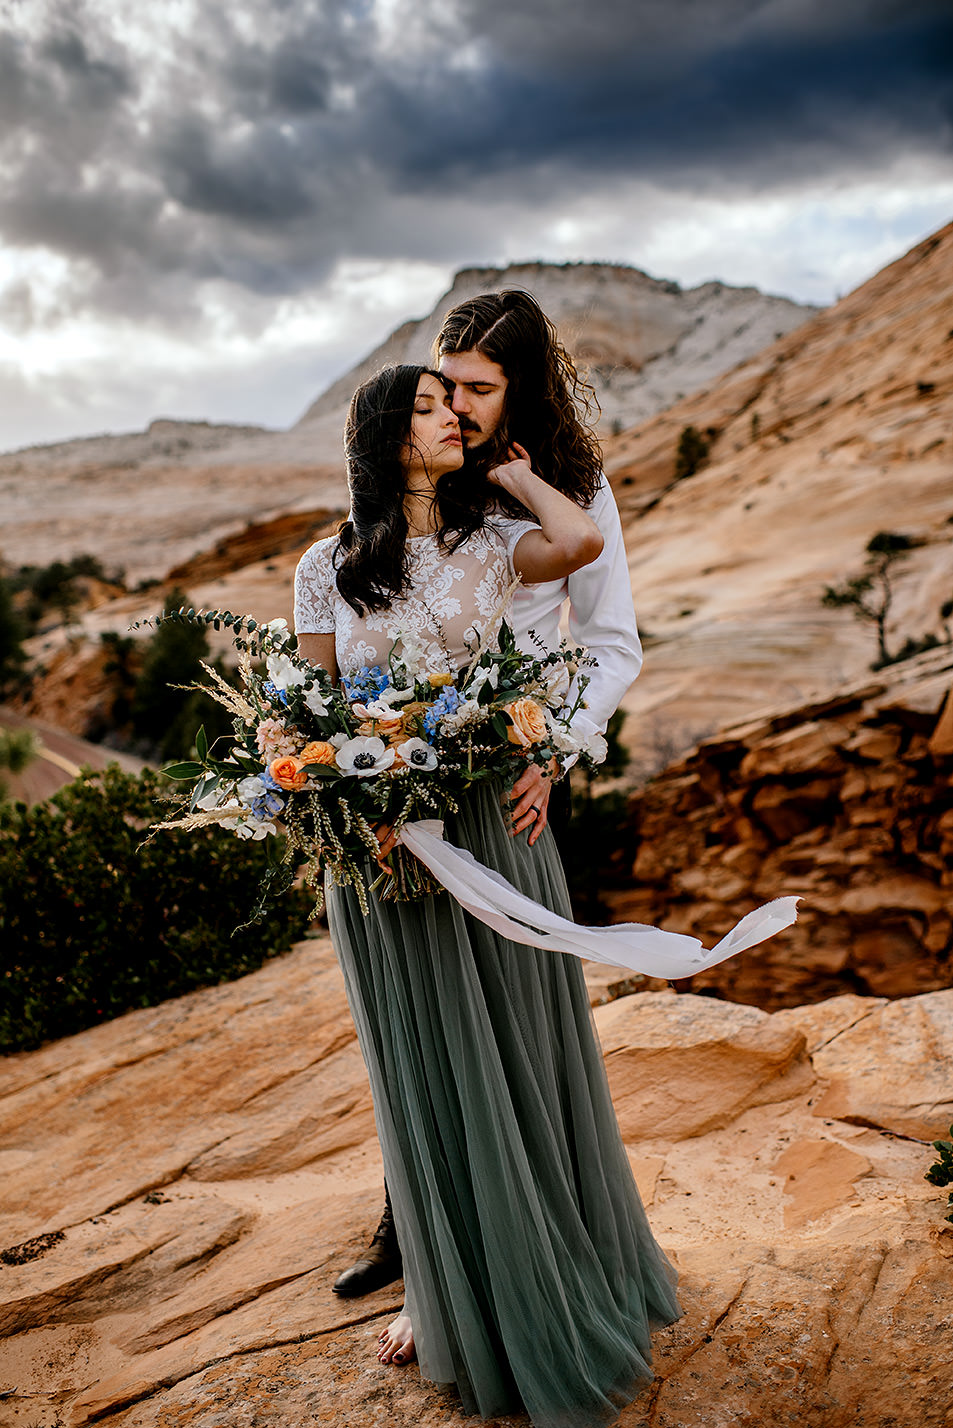 Zion_National_Park_Arizona_Wedding_Photographer_028.jpg